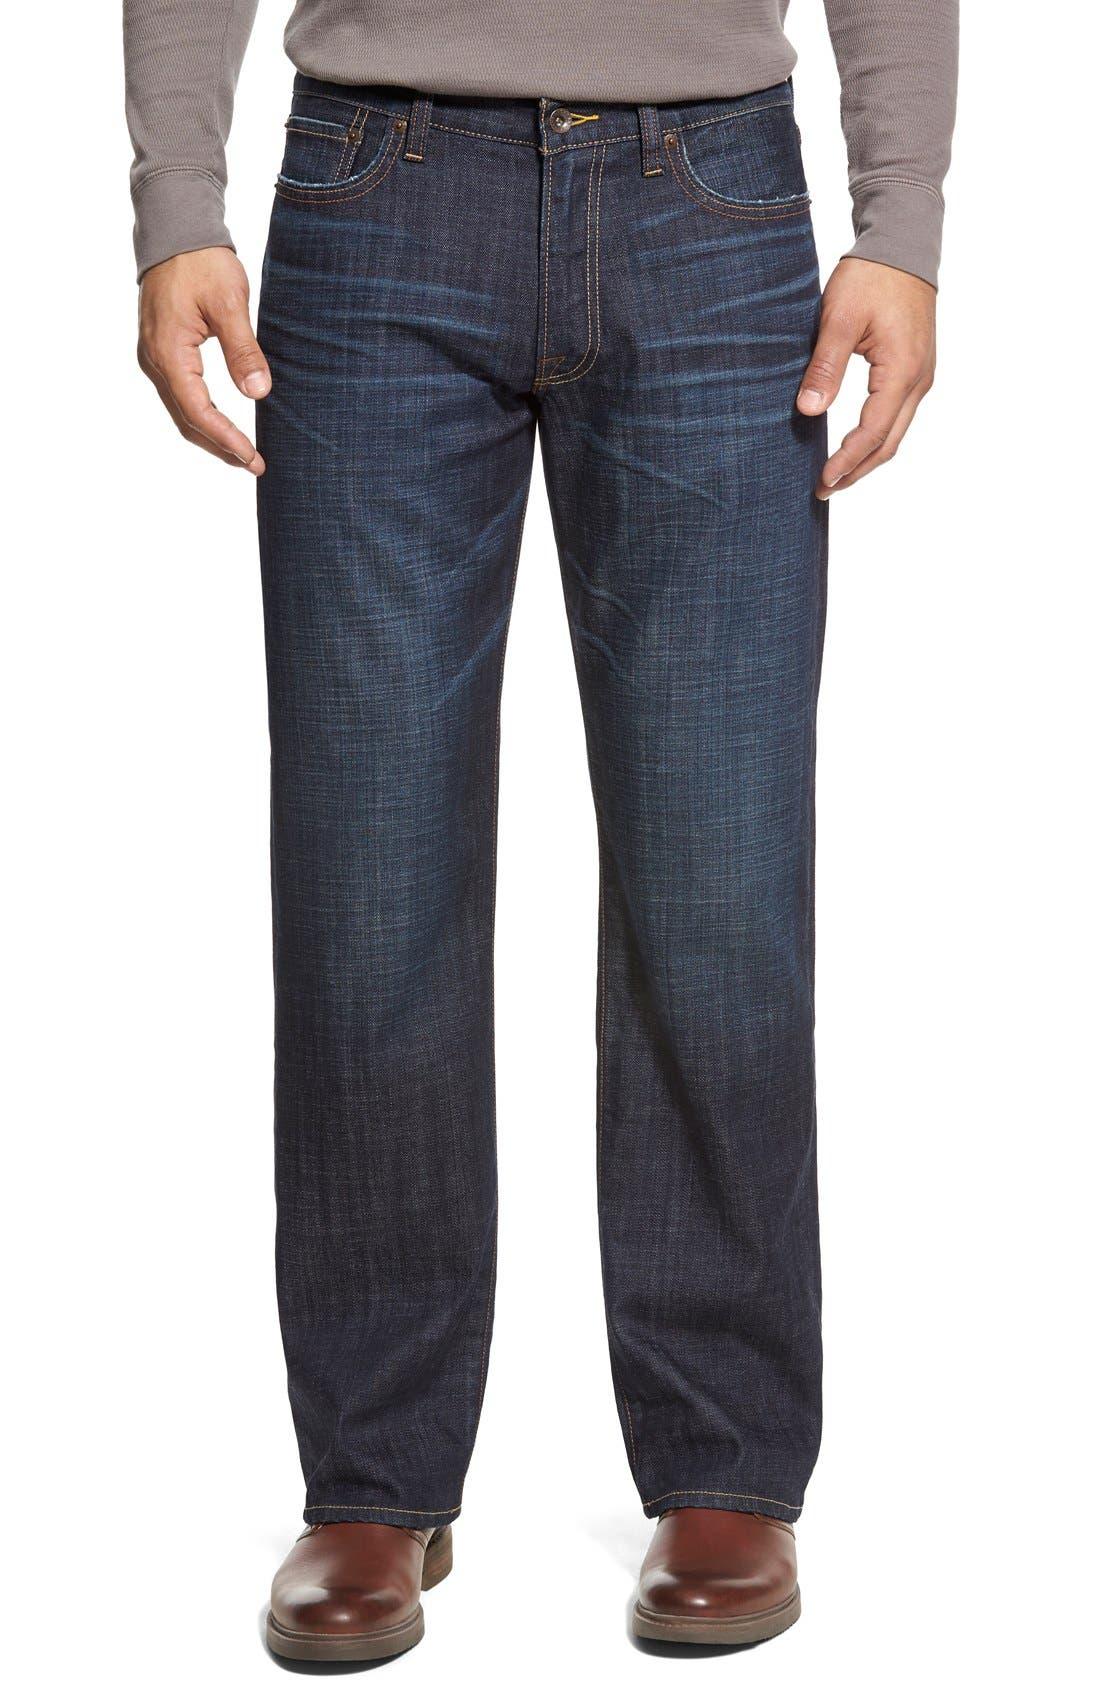 Alternate Image 1 Selected - Lucky Brand '361 Vintage' Straight Leg Jeans (Whispering Pines)